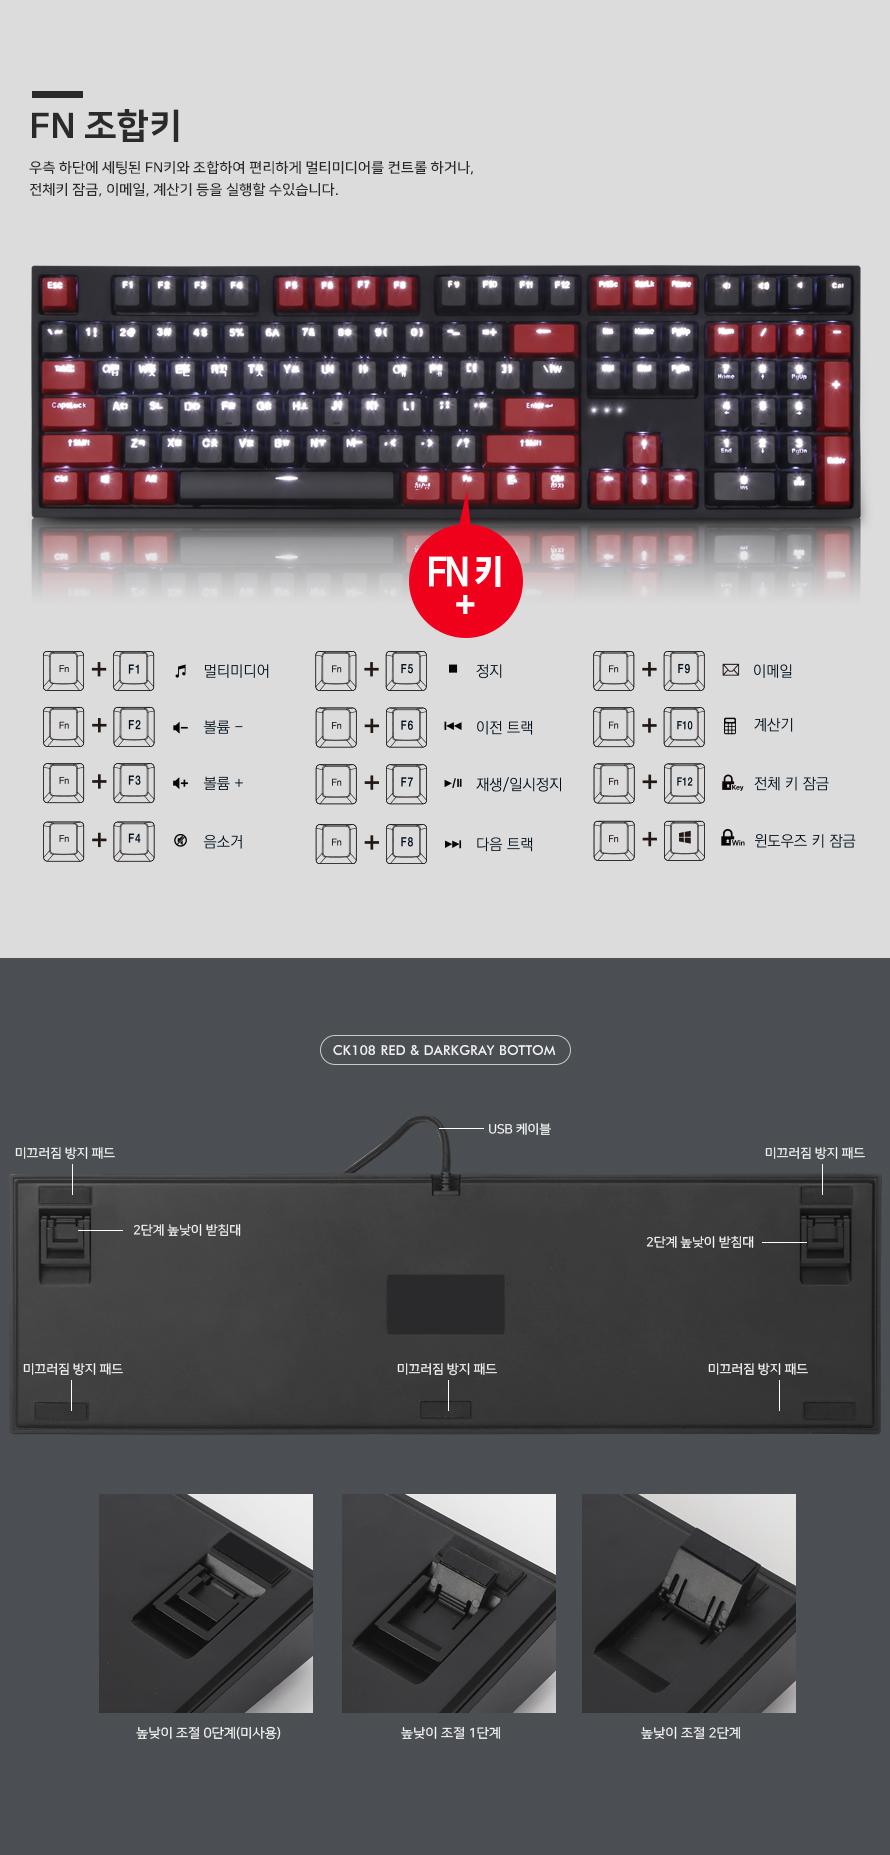 COX  CK108 레드/다크그레이 게이트론 LED 게이밍 기계식(S1, 녹축)